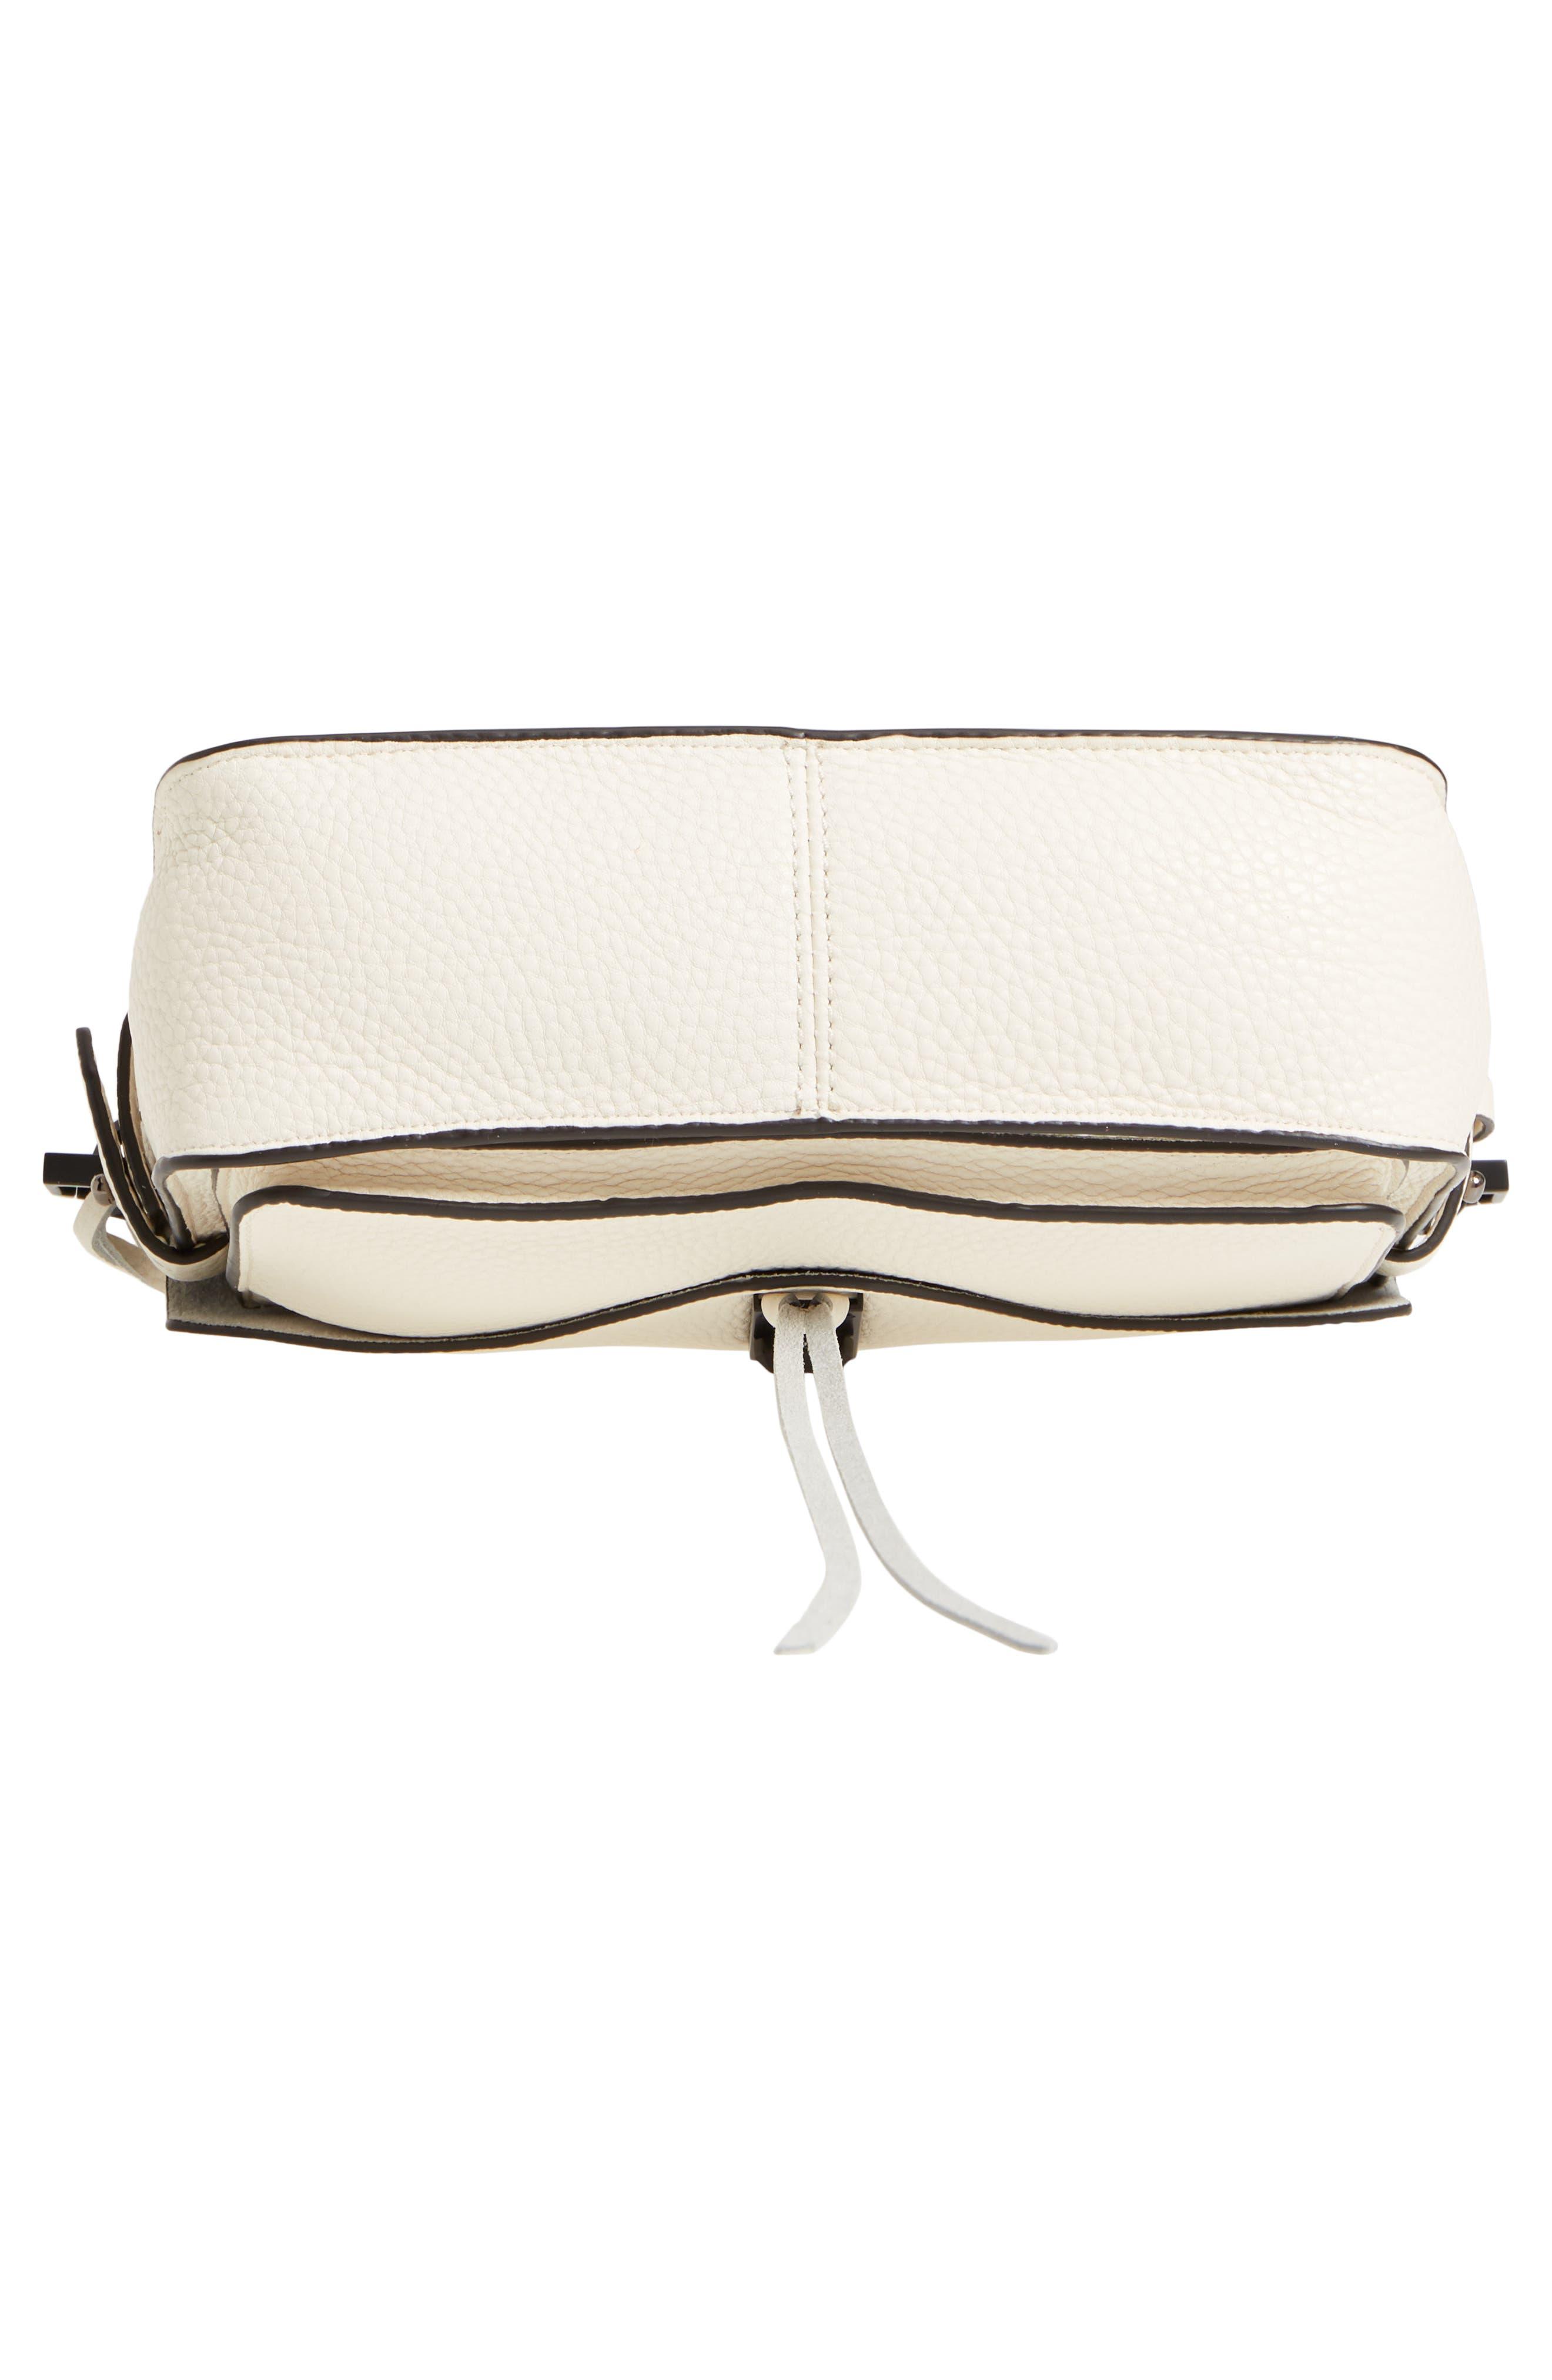 'Small Darren' Leather Messenger Bag,                             Alternate thumbnail 5, color,                             Antique White